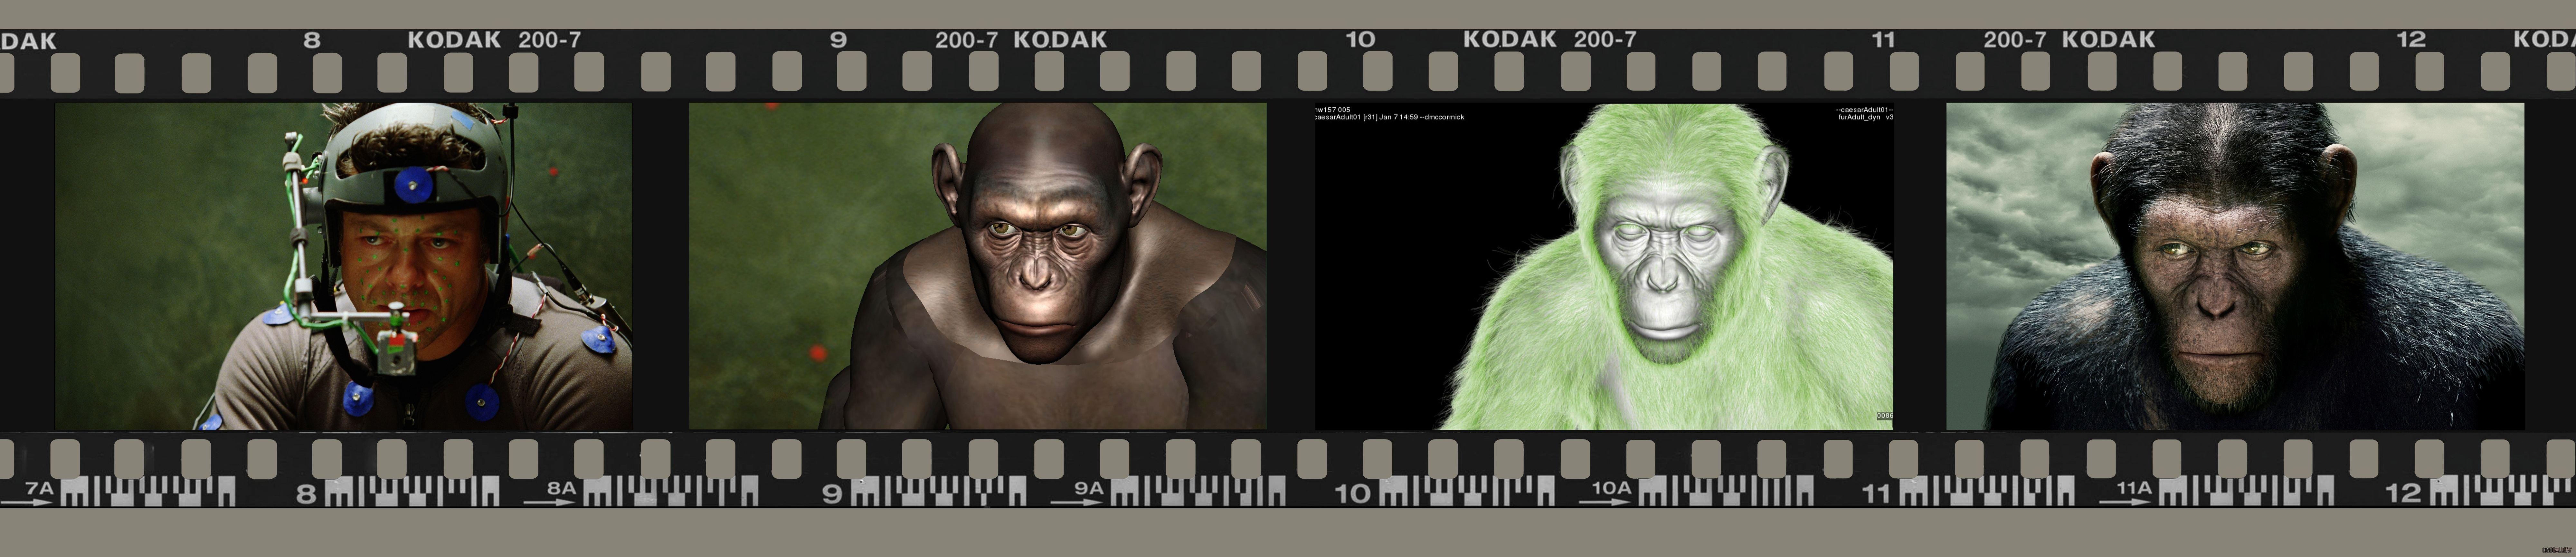 со съемок Восстание планеты обезьян Энди Серкис,